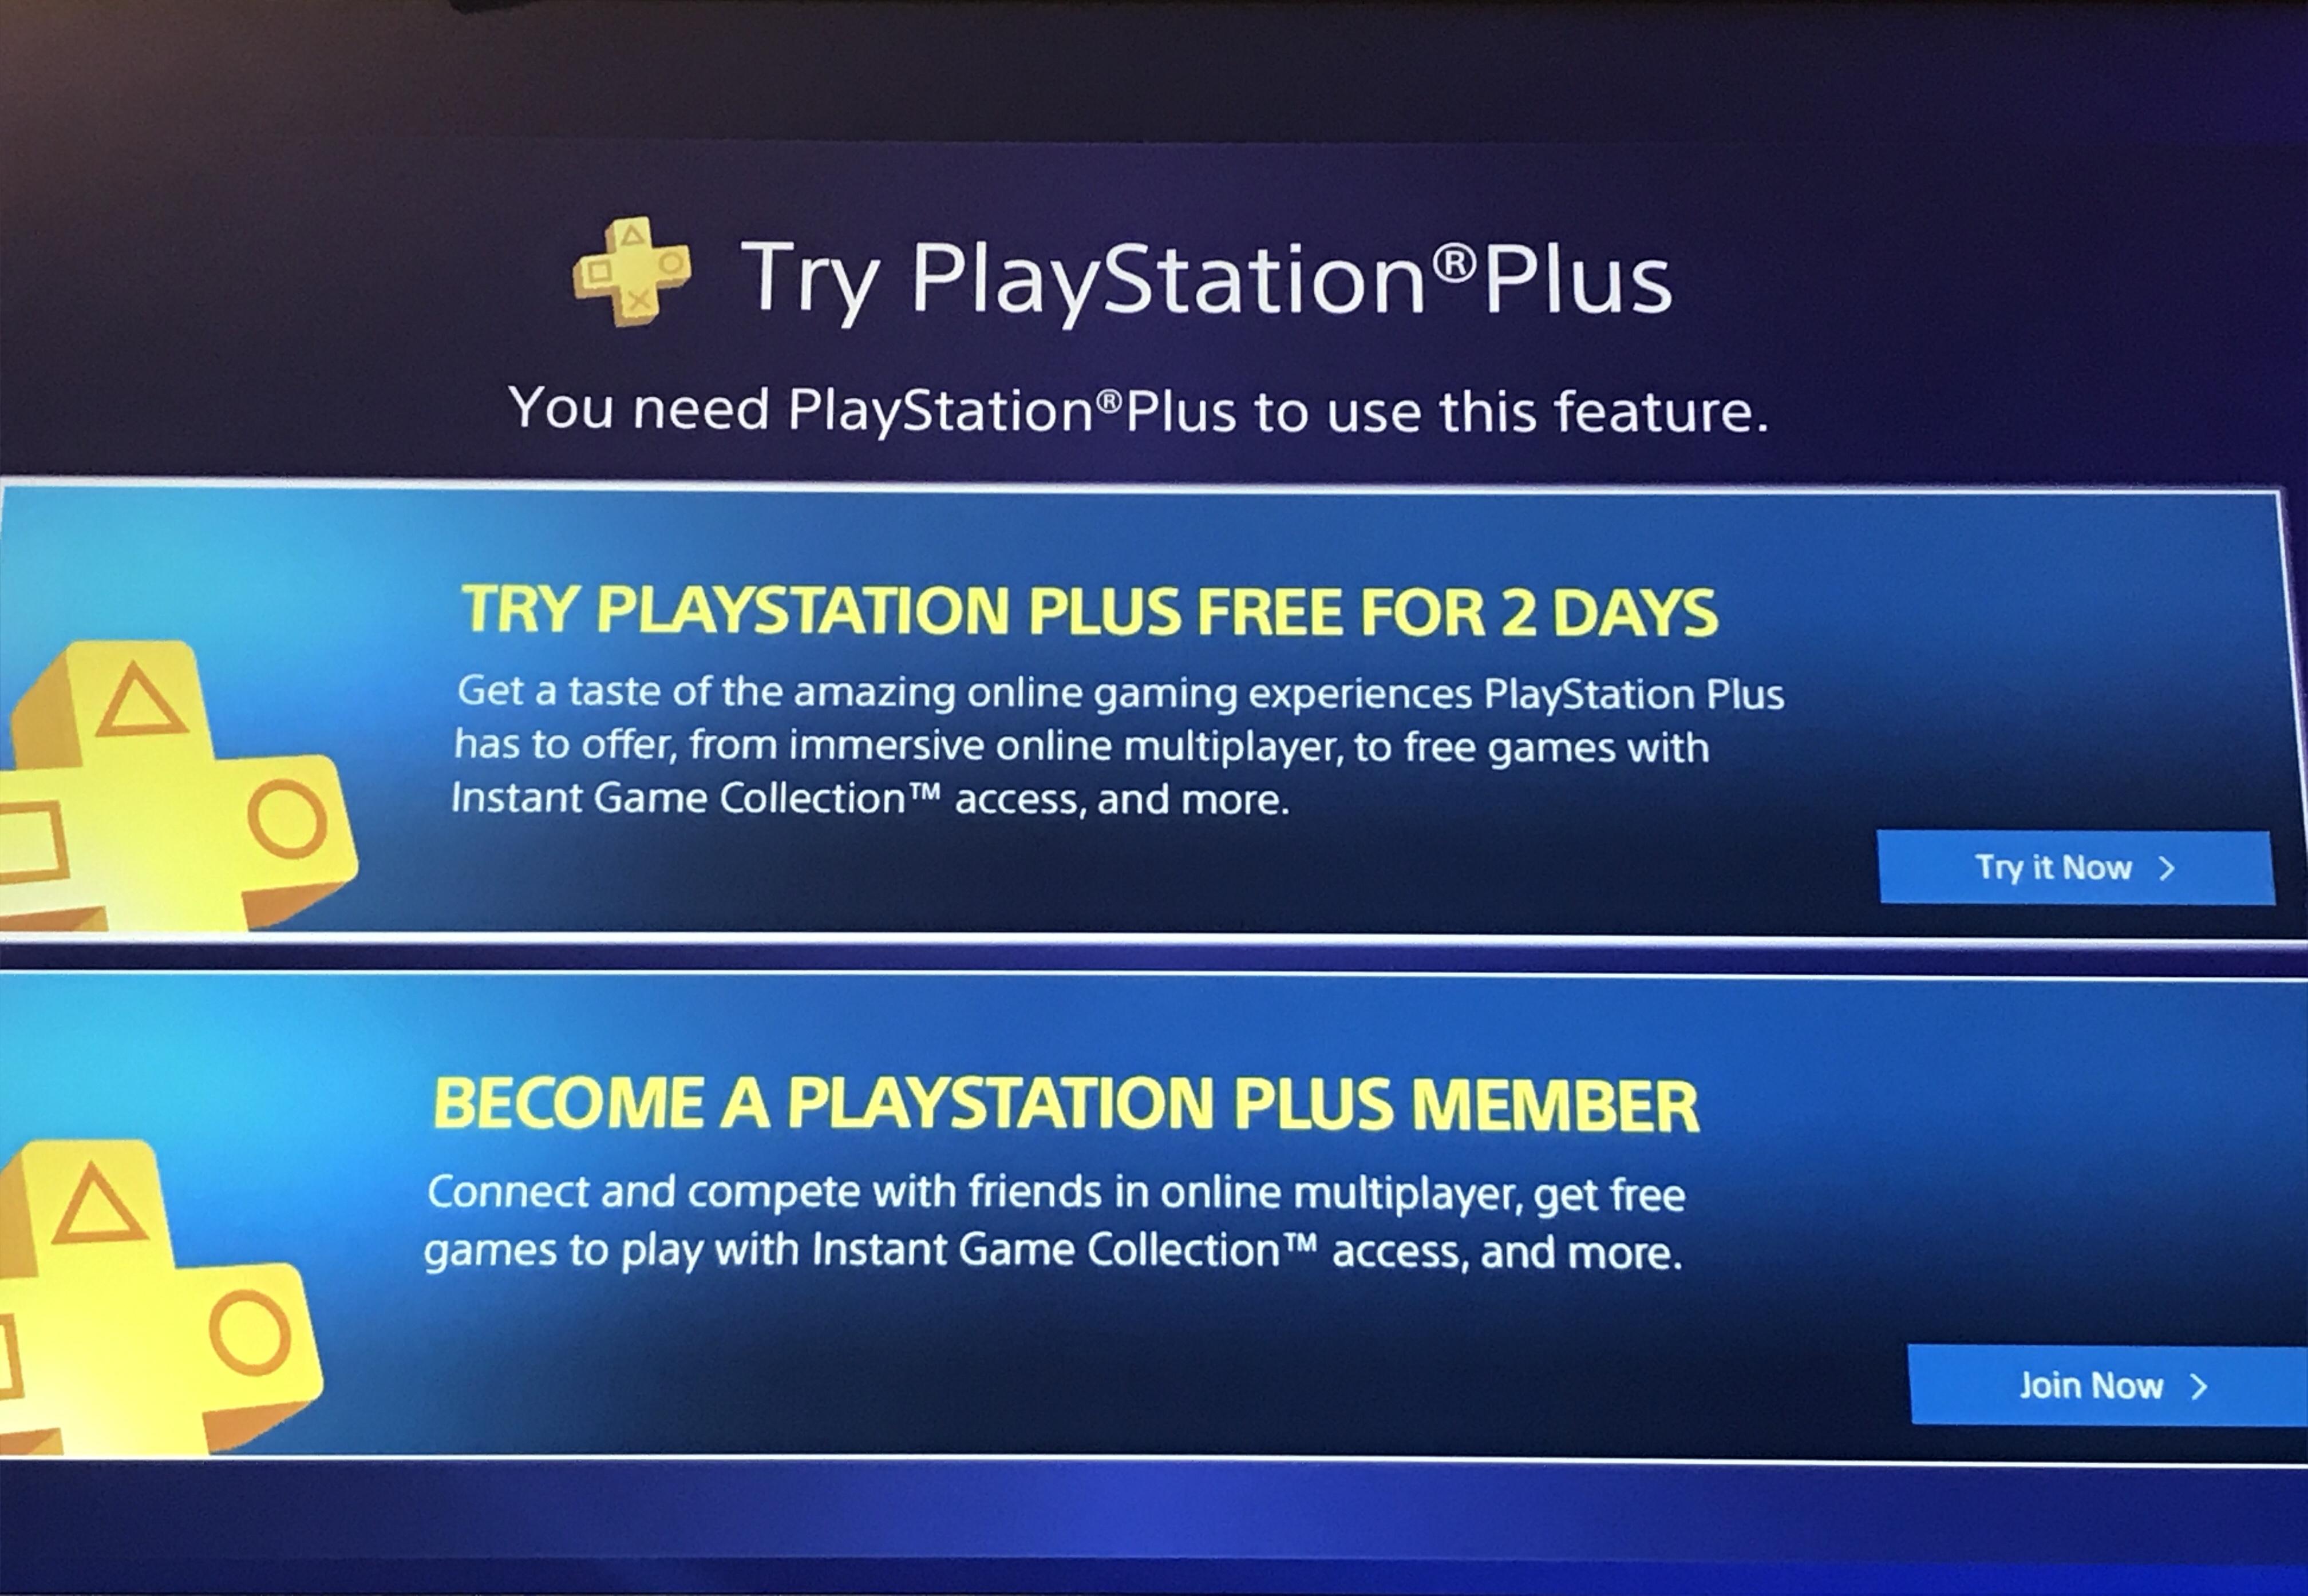 playstation plus free trial code 2018